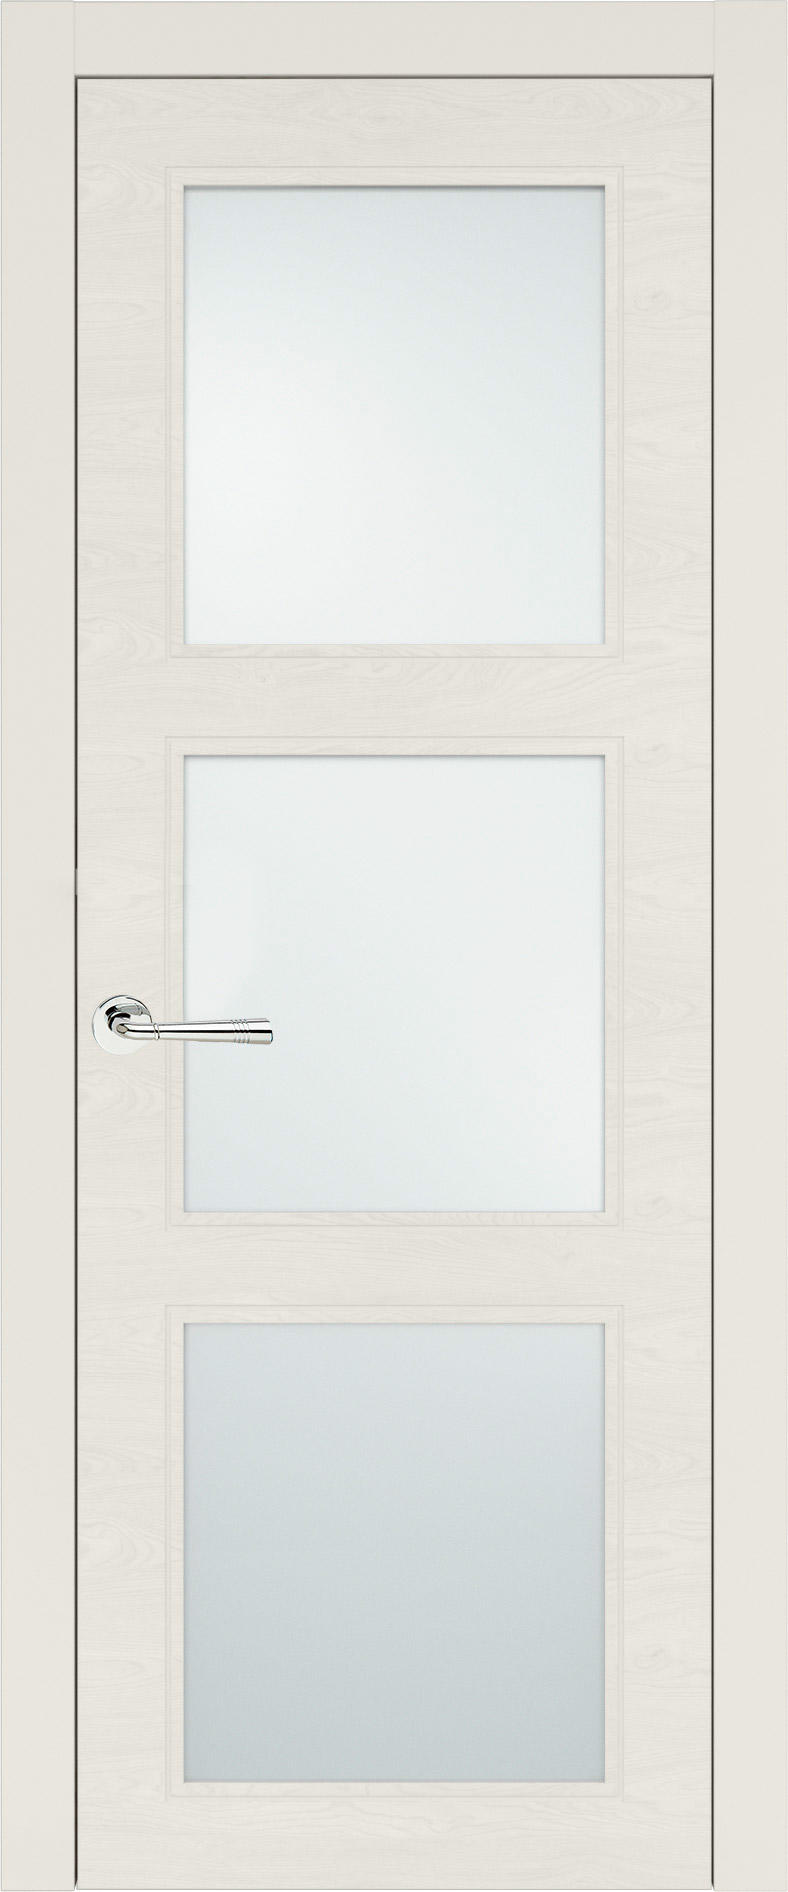 Milano Neo Classic цвет - Бежевая эмаль по шпону (RAL 9010) Со стеклом (ДО)